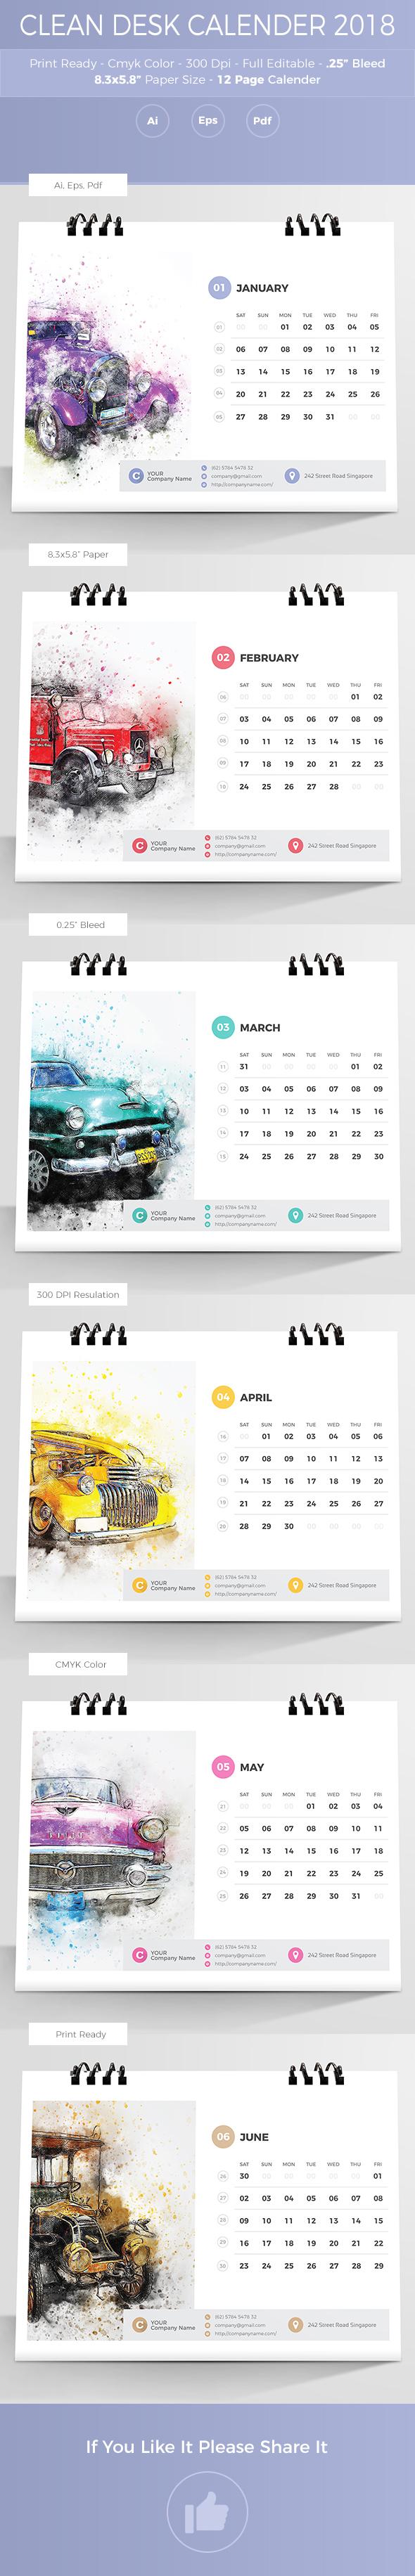 Clean Desk Calendar 2019 on Behance